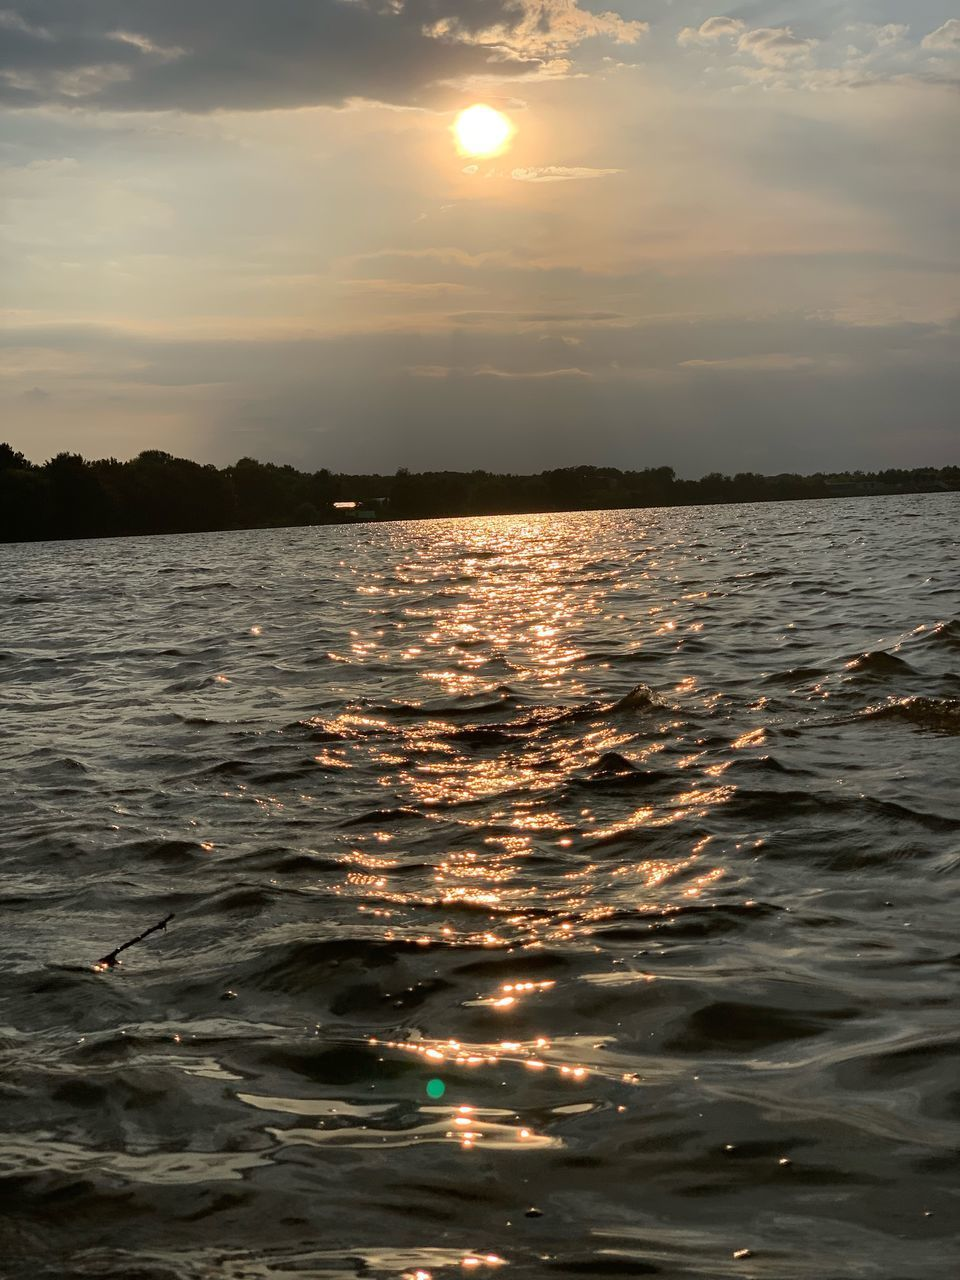 water, sky, sunset, sea, beauty in nature, scenics - nature, tranquility, cloud - sky, nature, tranquil scene, sun, waterfront, reflection, idyllic, orange color, no people, outdoors, sunlight, marine